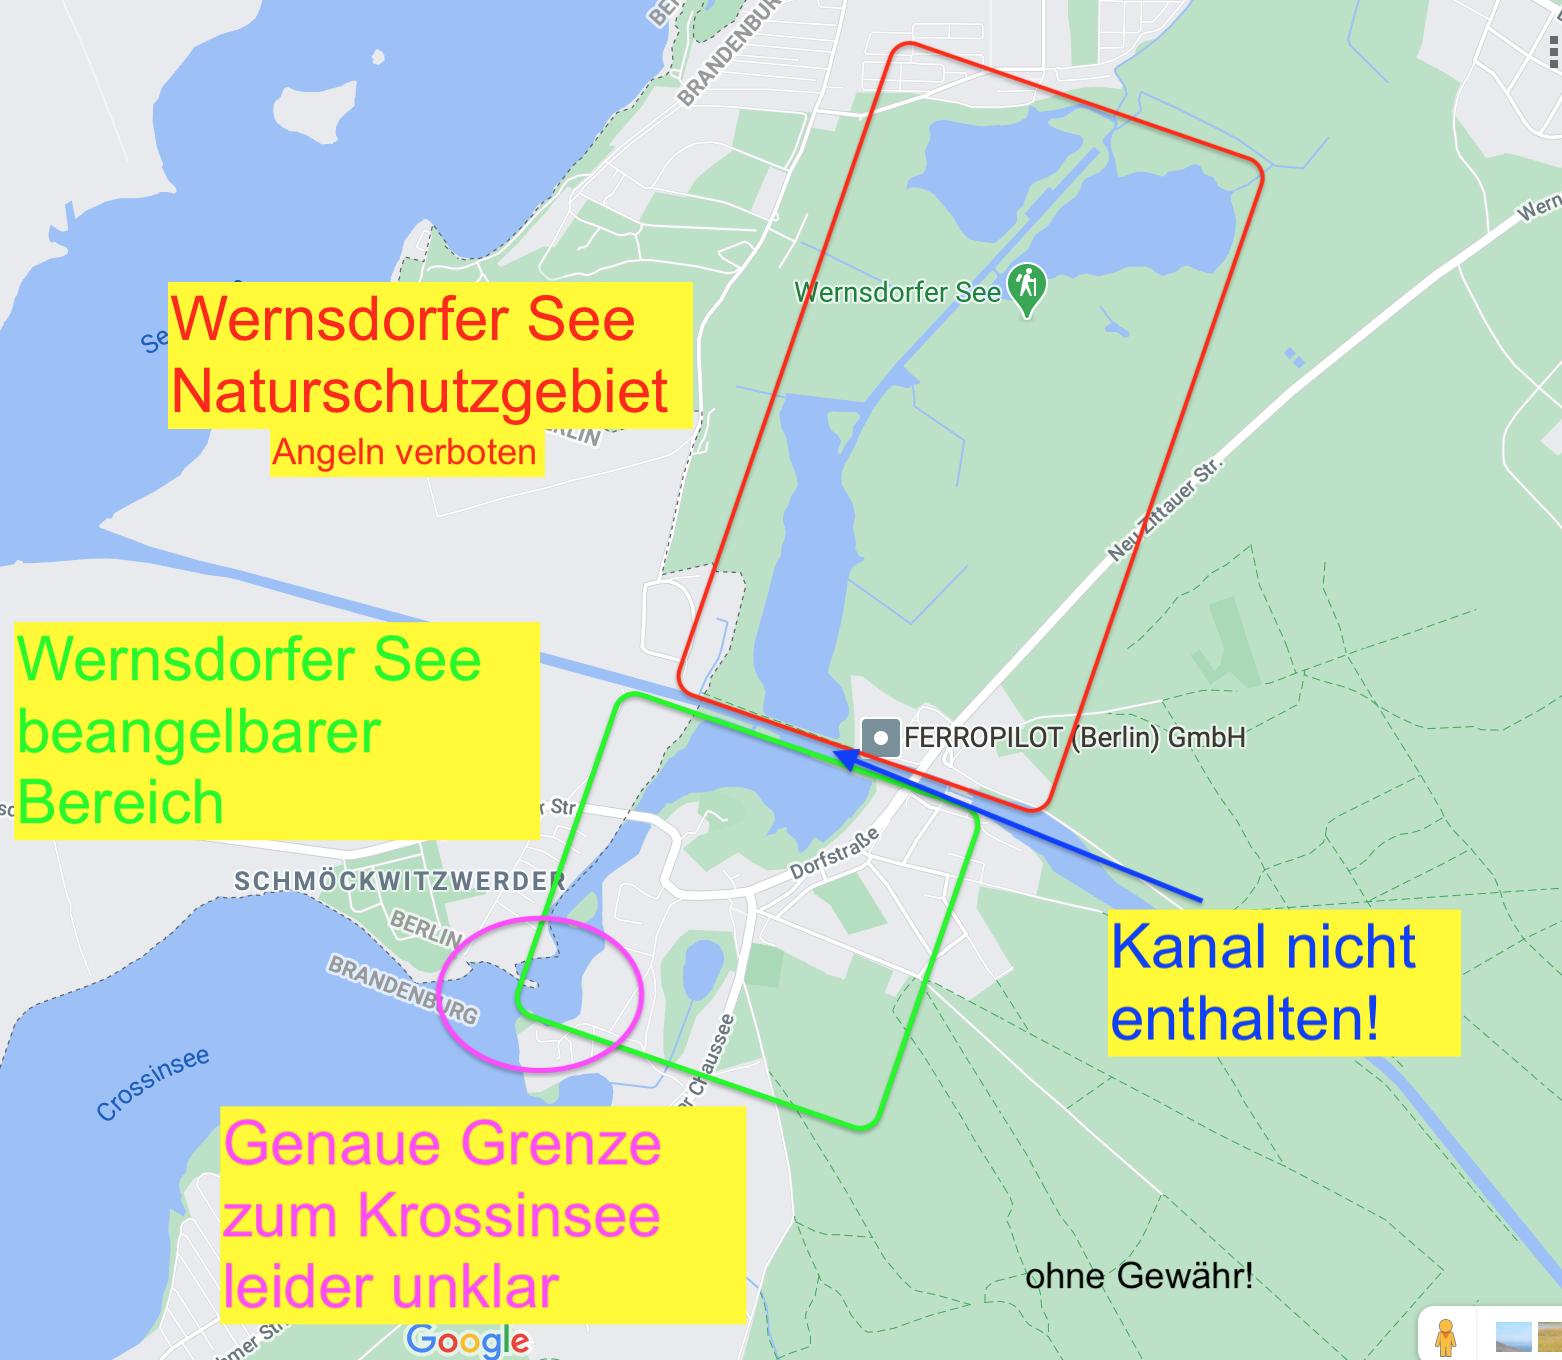 Angelgebiet Wernsdorfer See.png